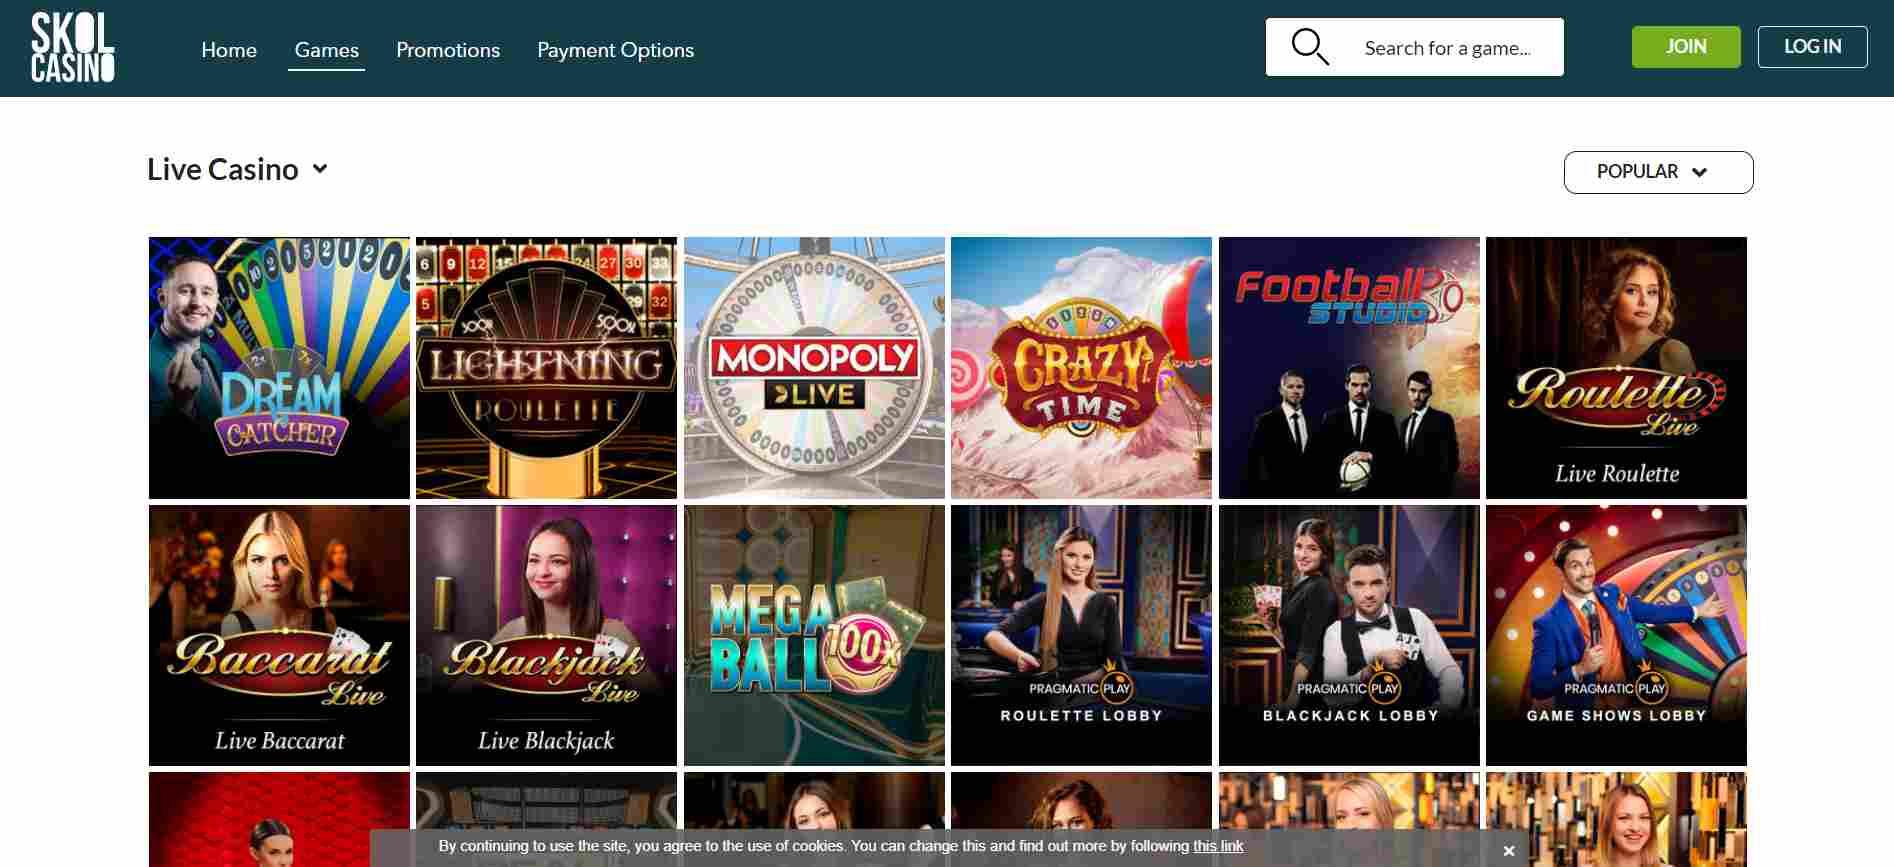 Skol Casino on Desktop